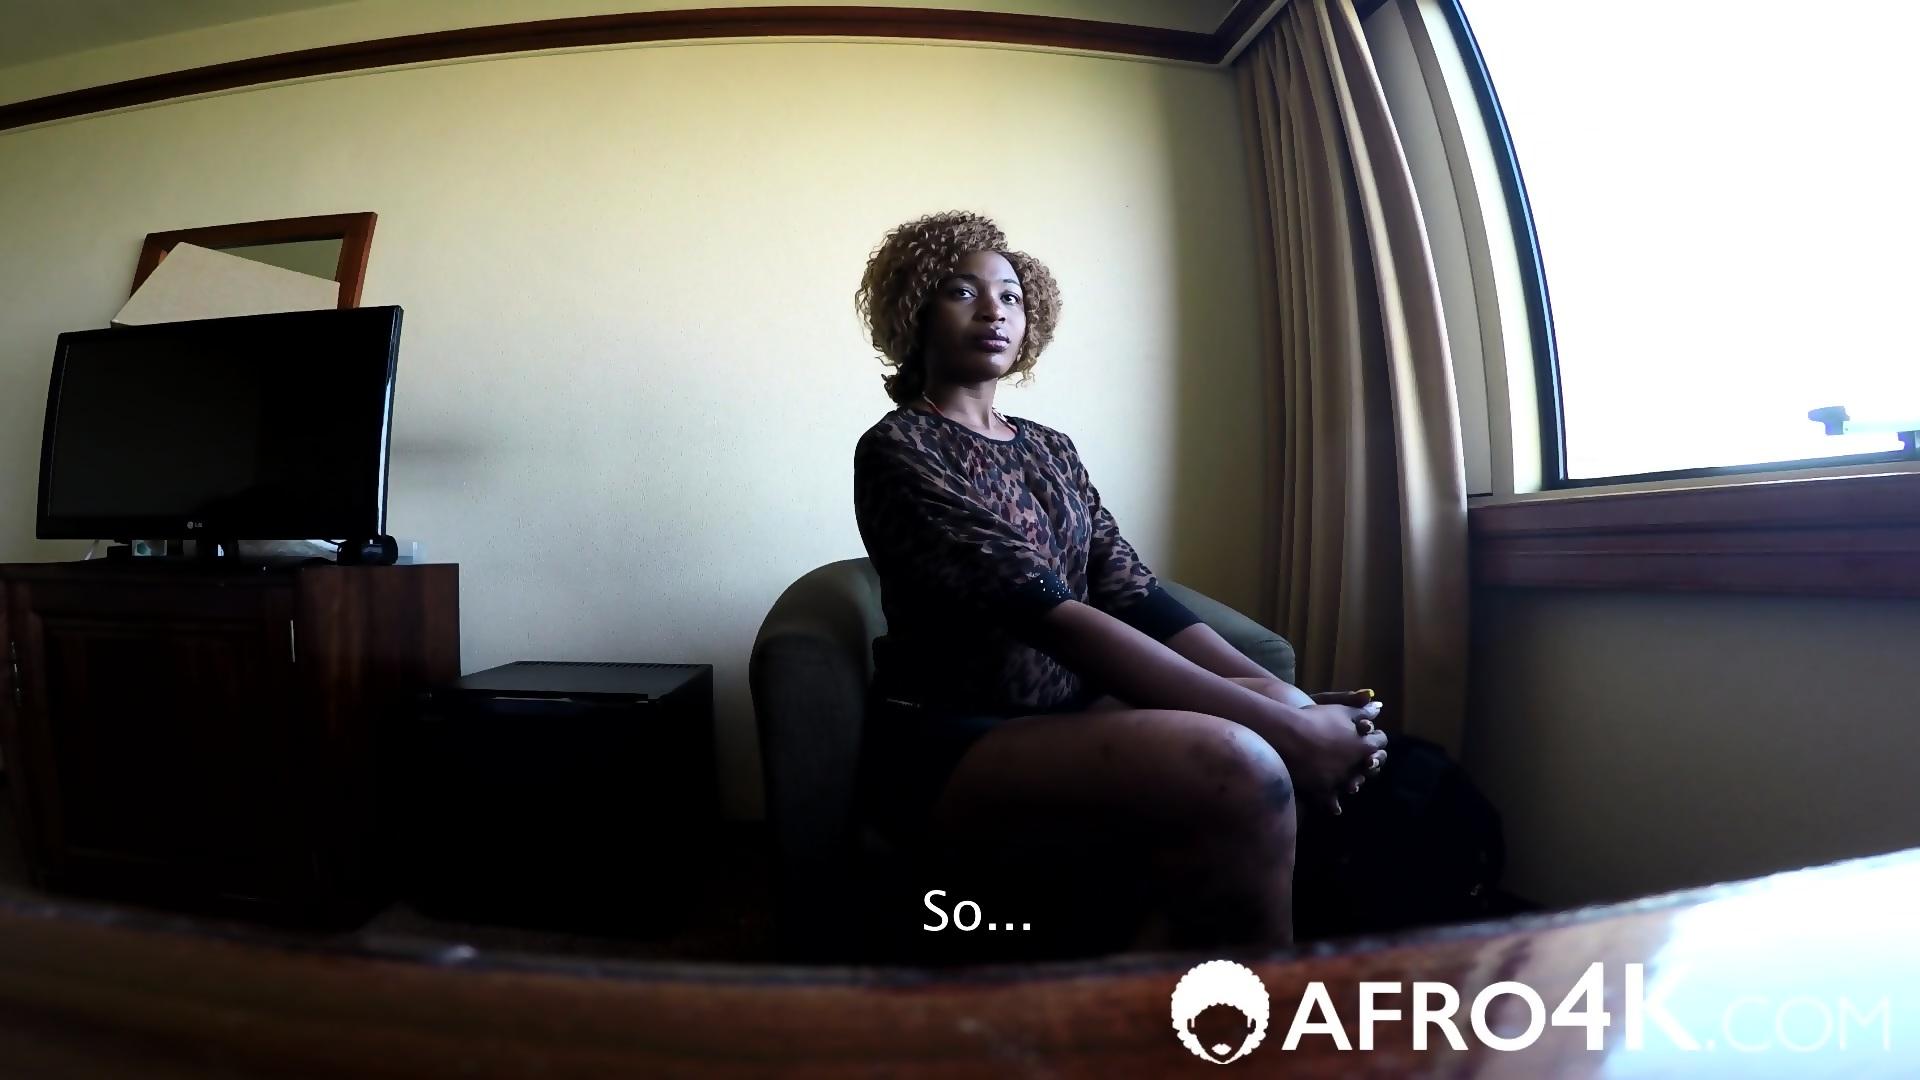 hardcore porno casting lesbický sex zdarma ke stažení videa